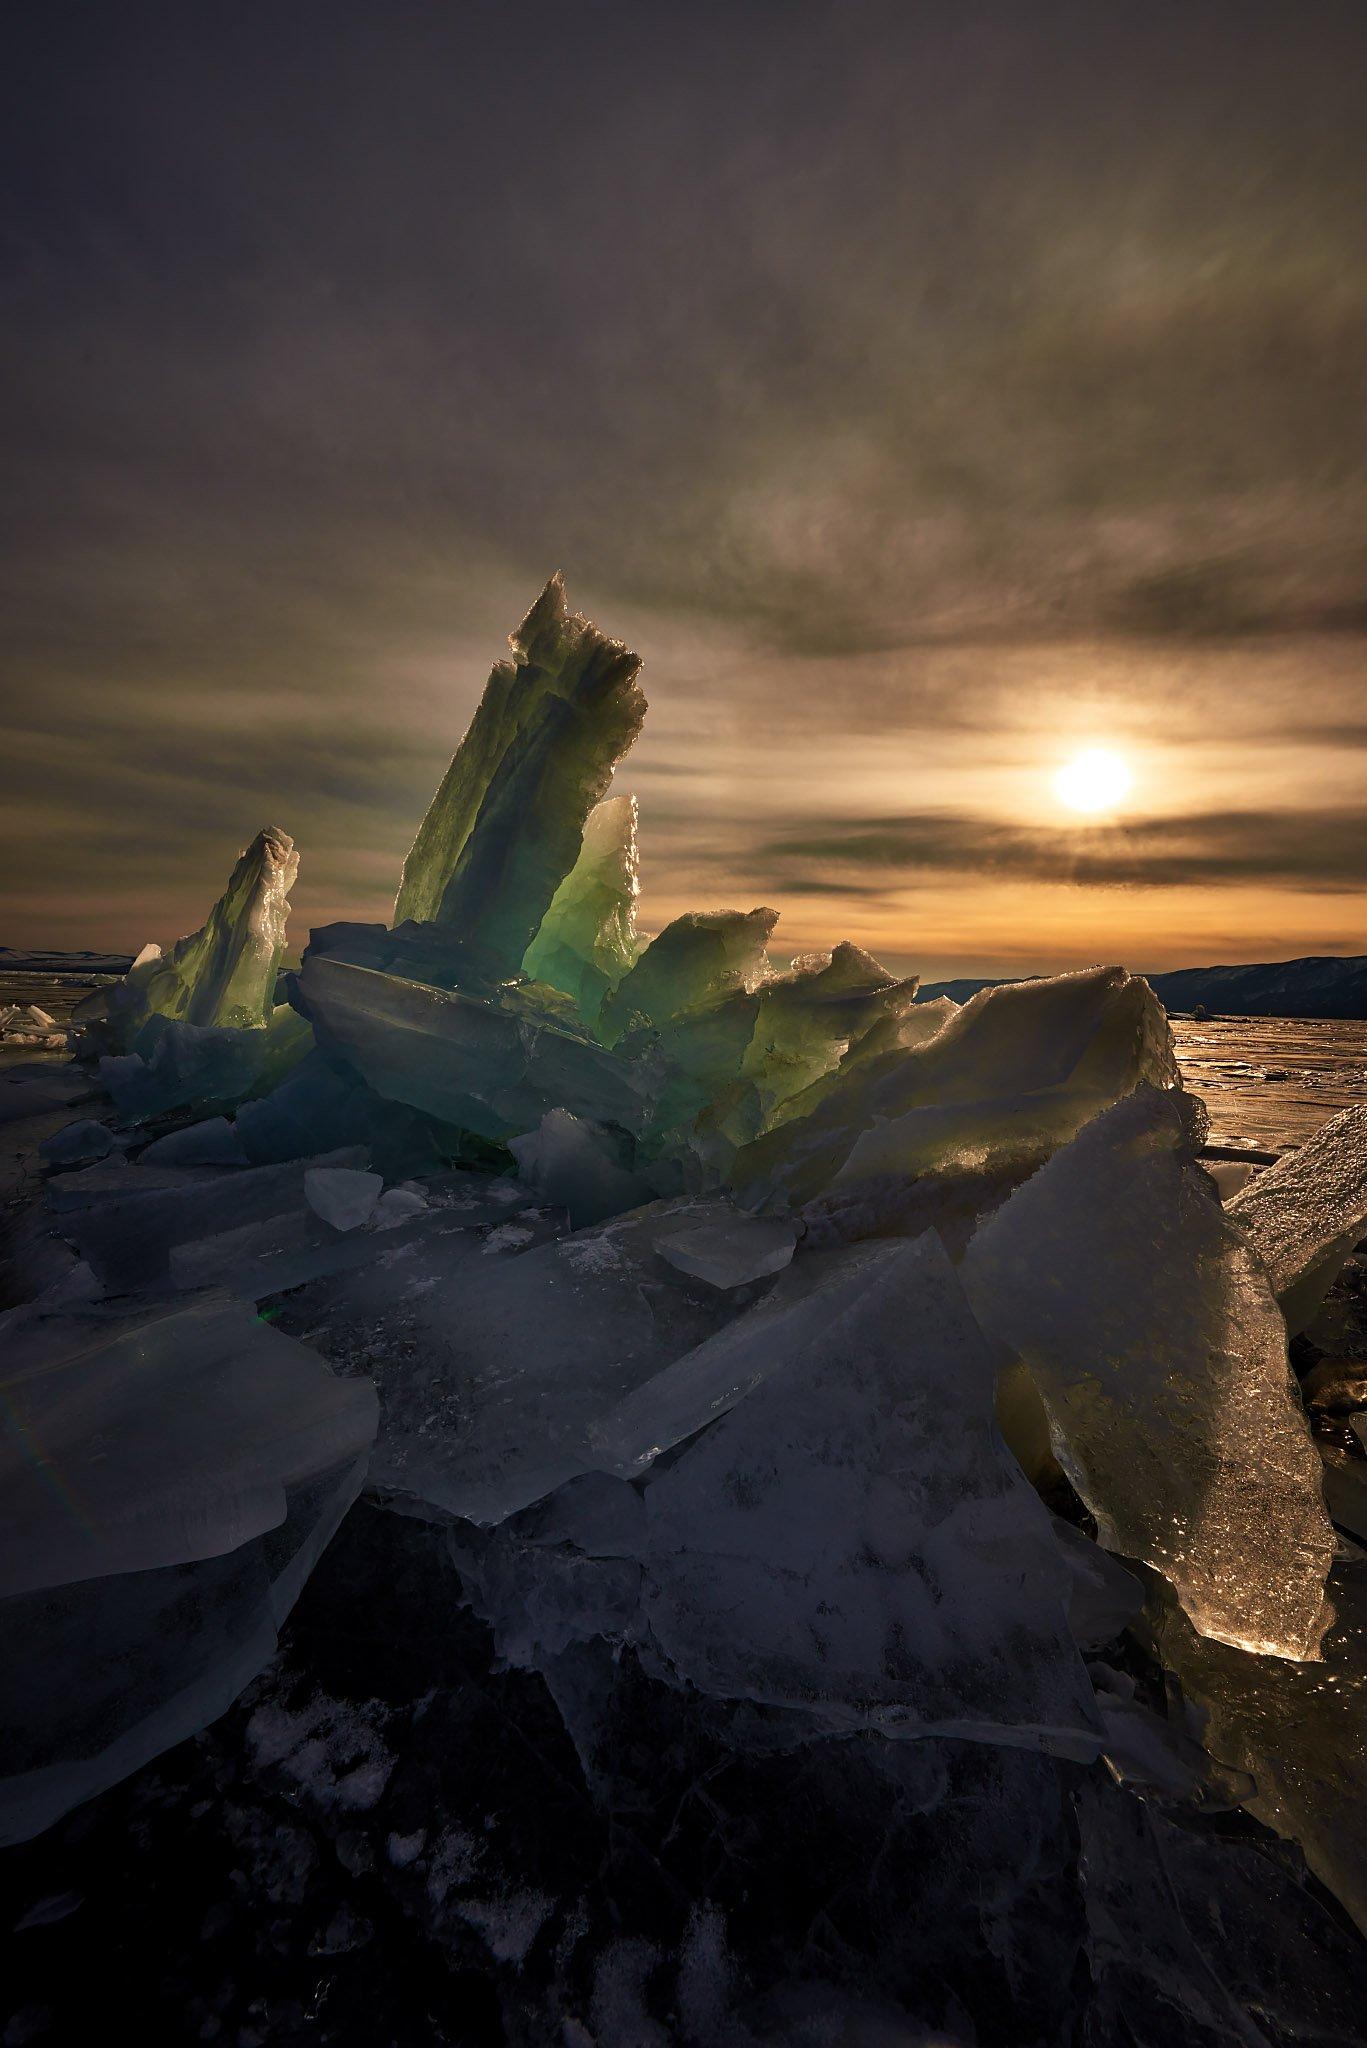 байкал озеро лед, Cherepko Denis